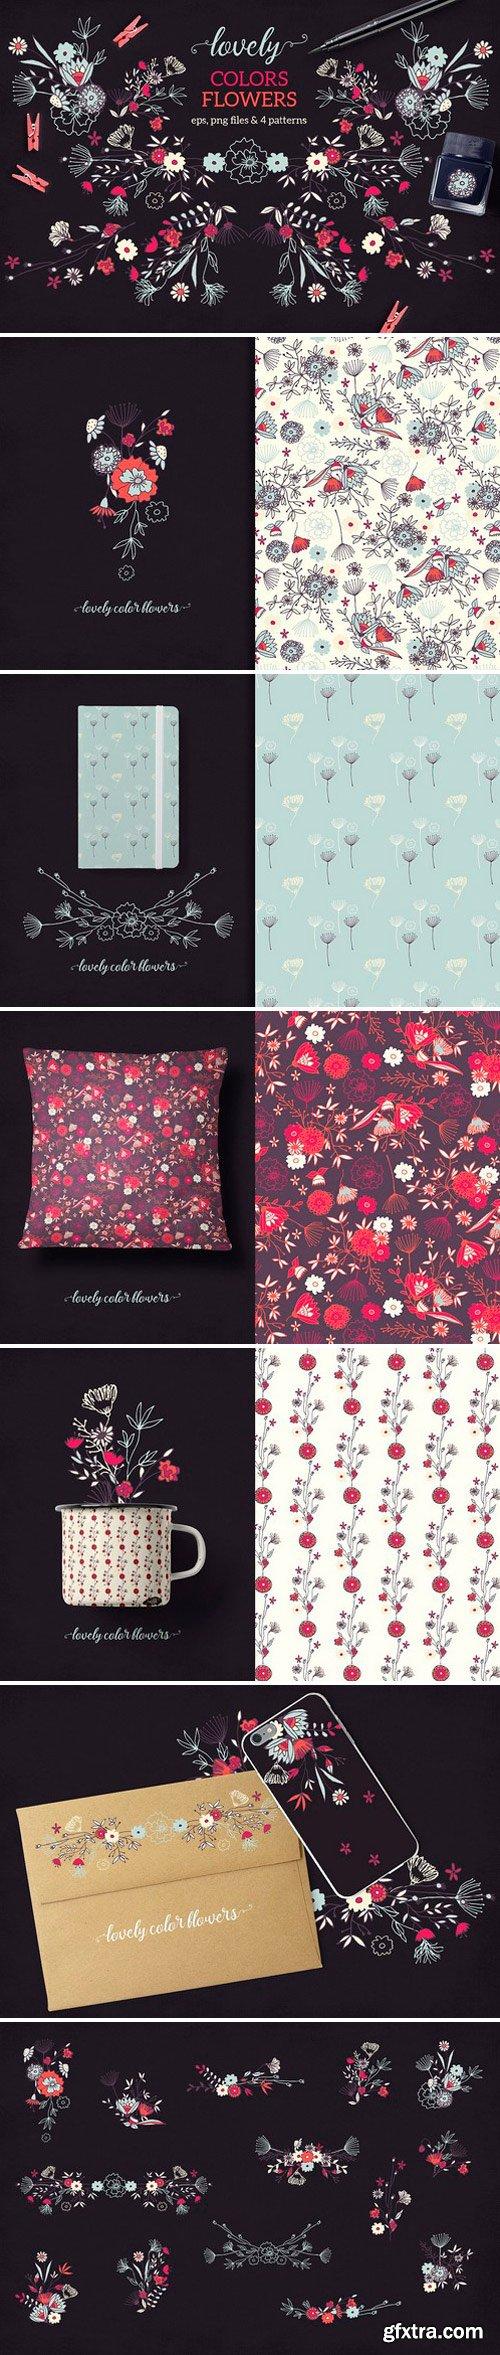 CM - Lovely Colors Flowers 949255